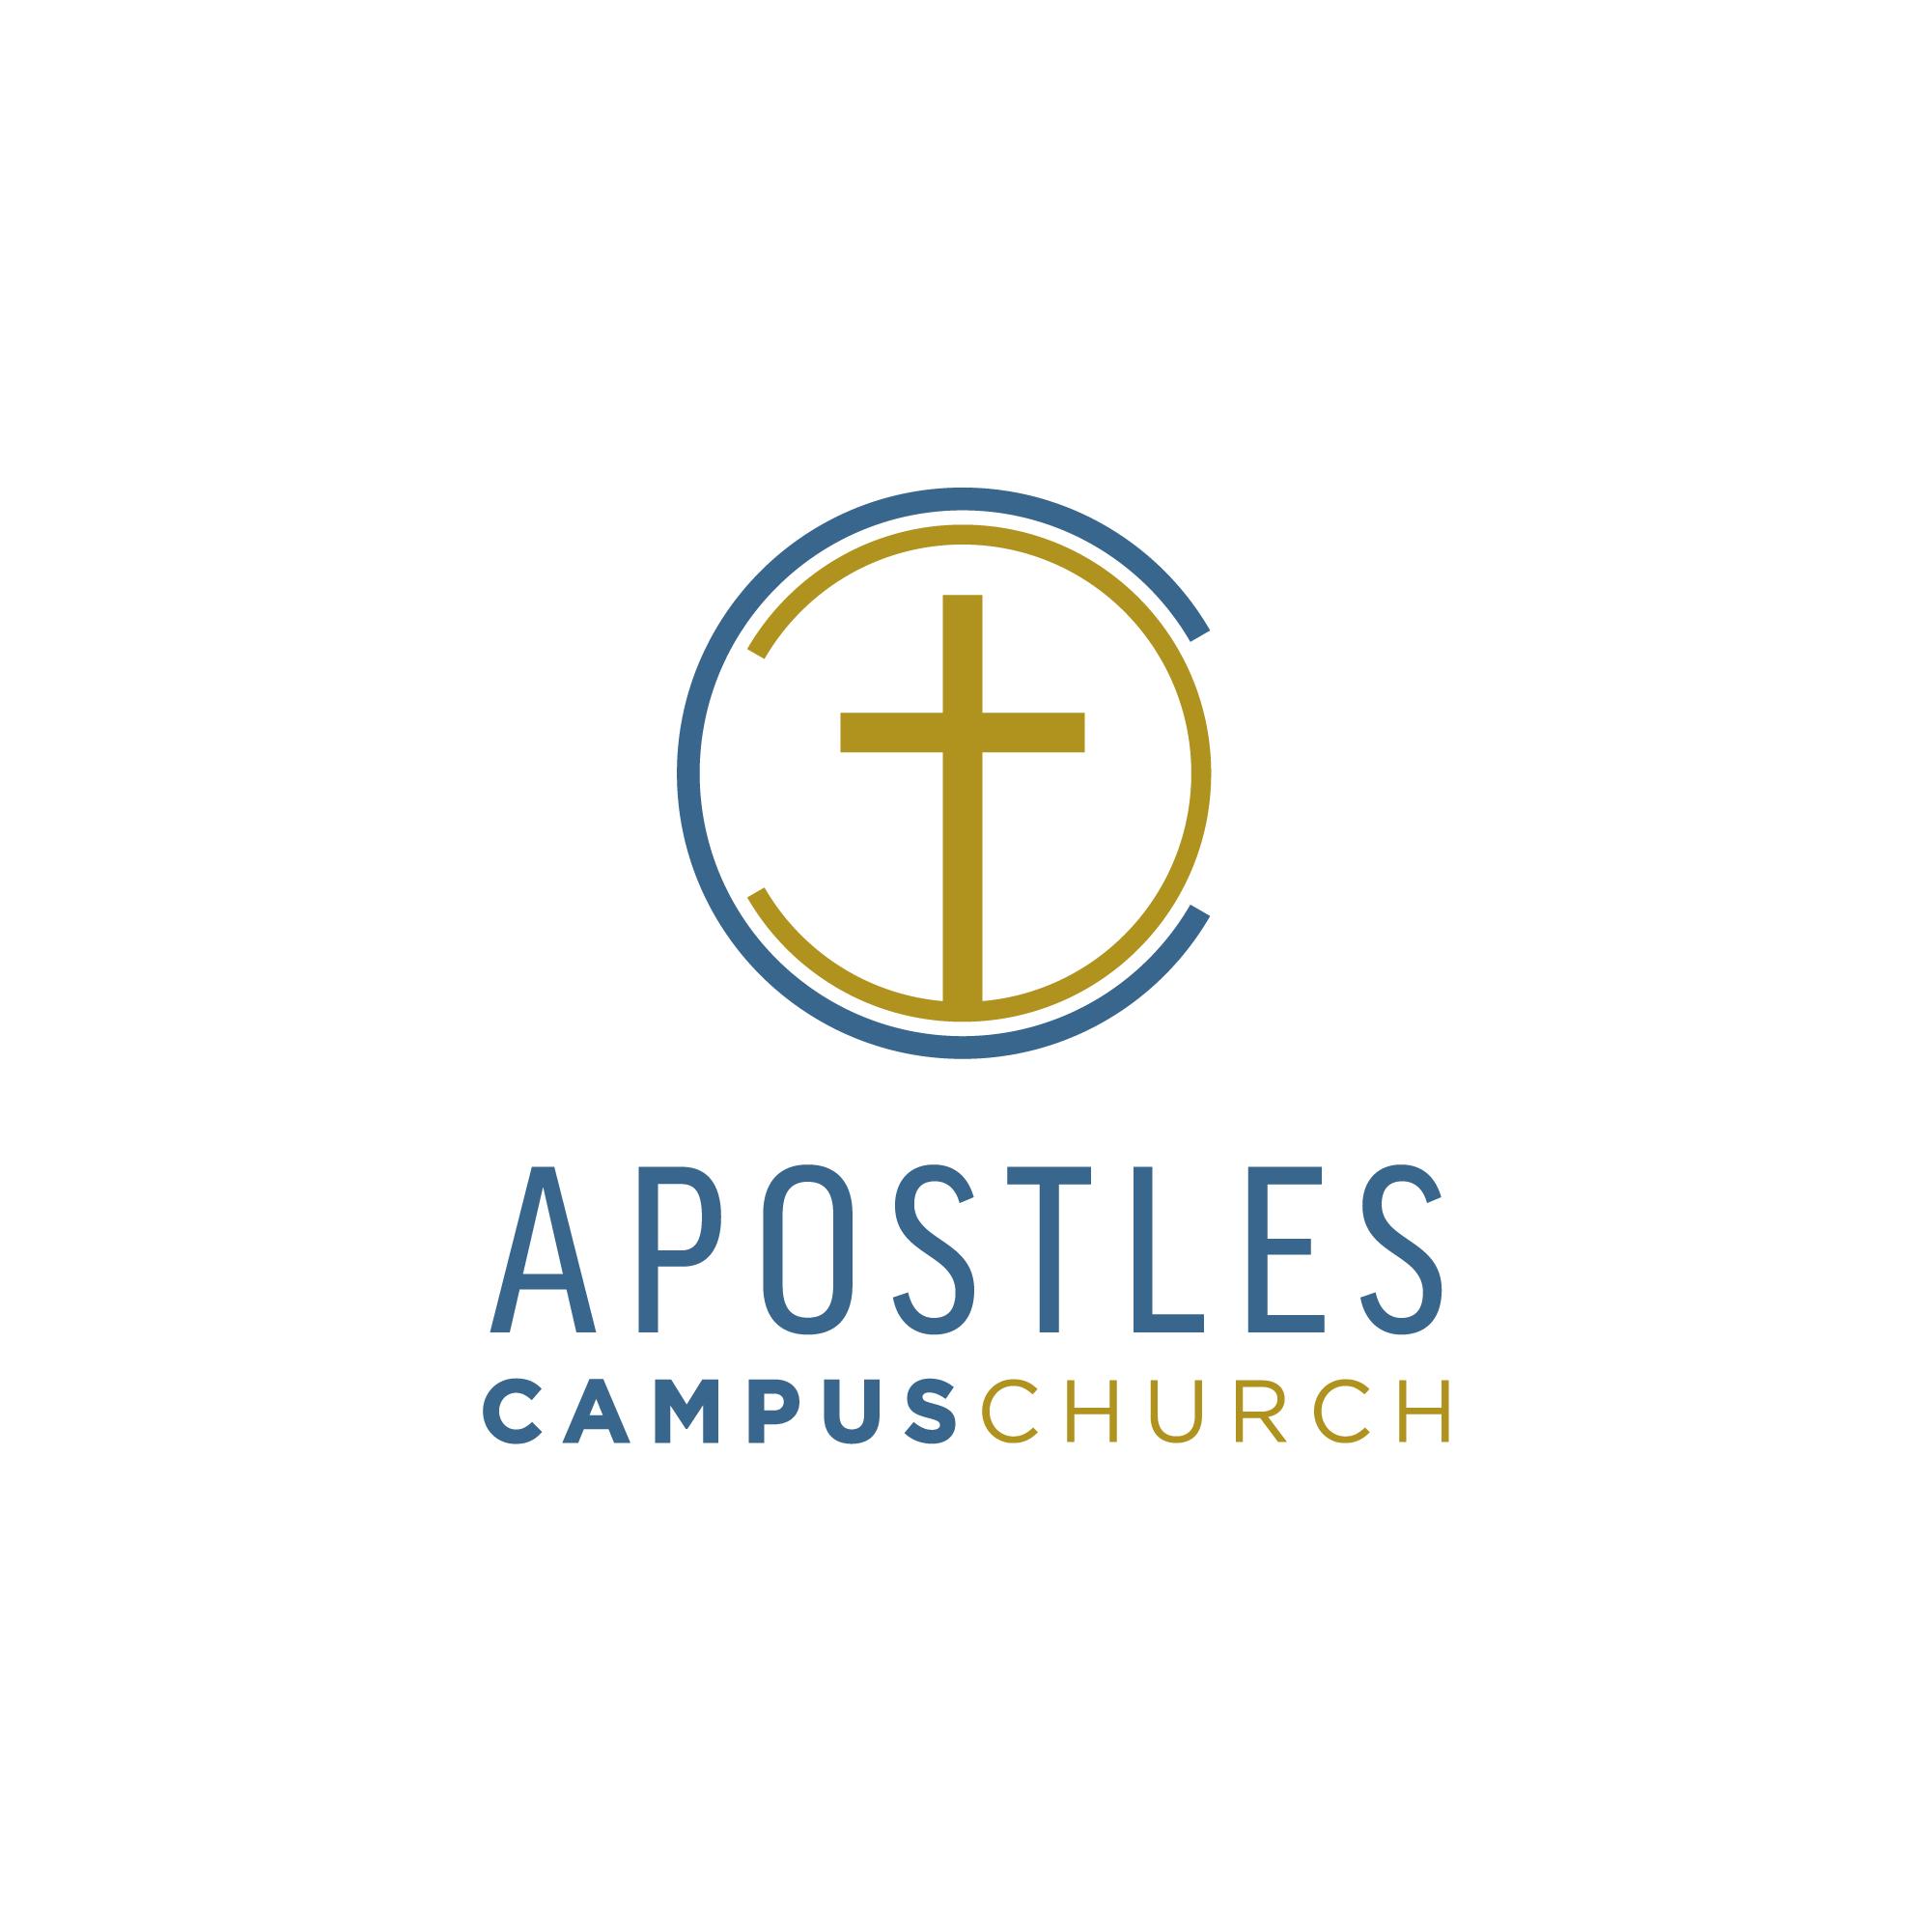 Apostles_Campus_Church_Logo_color_square_daniel-bonner.com.png